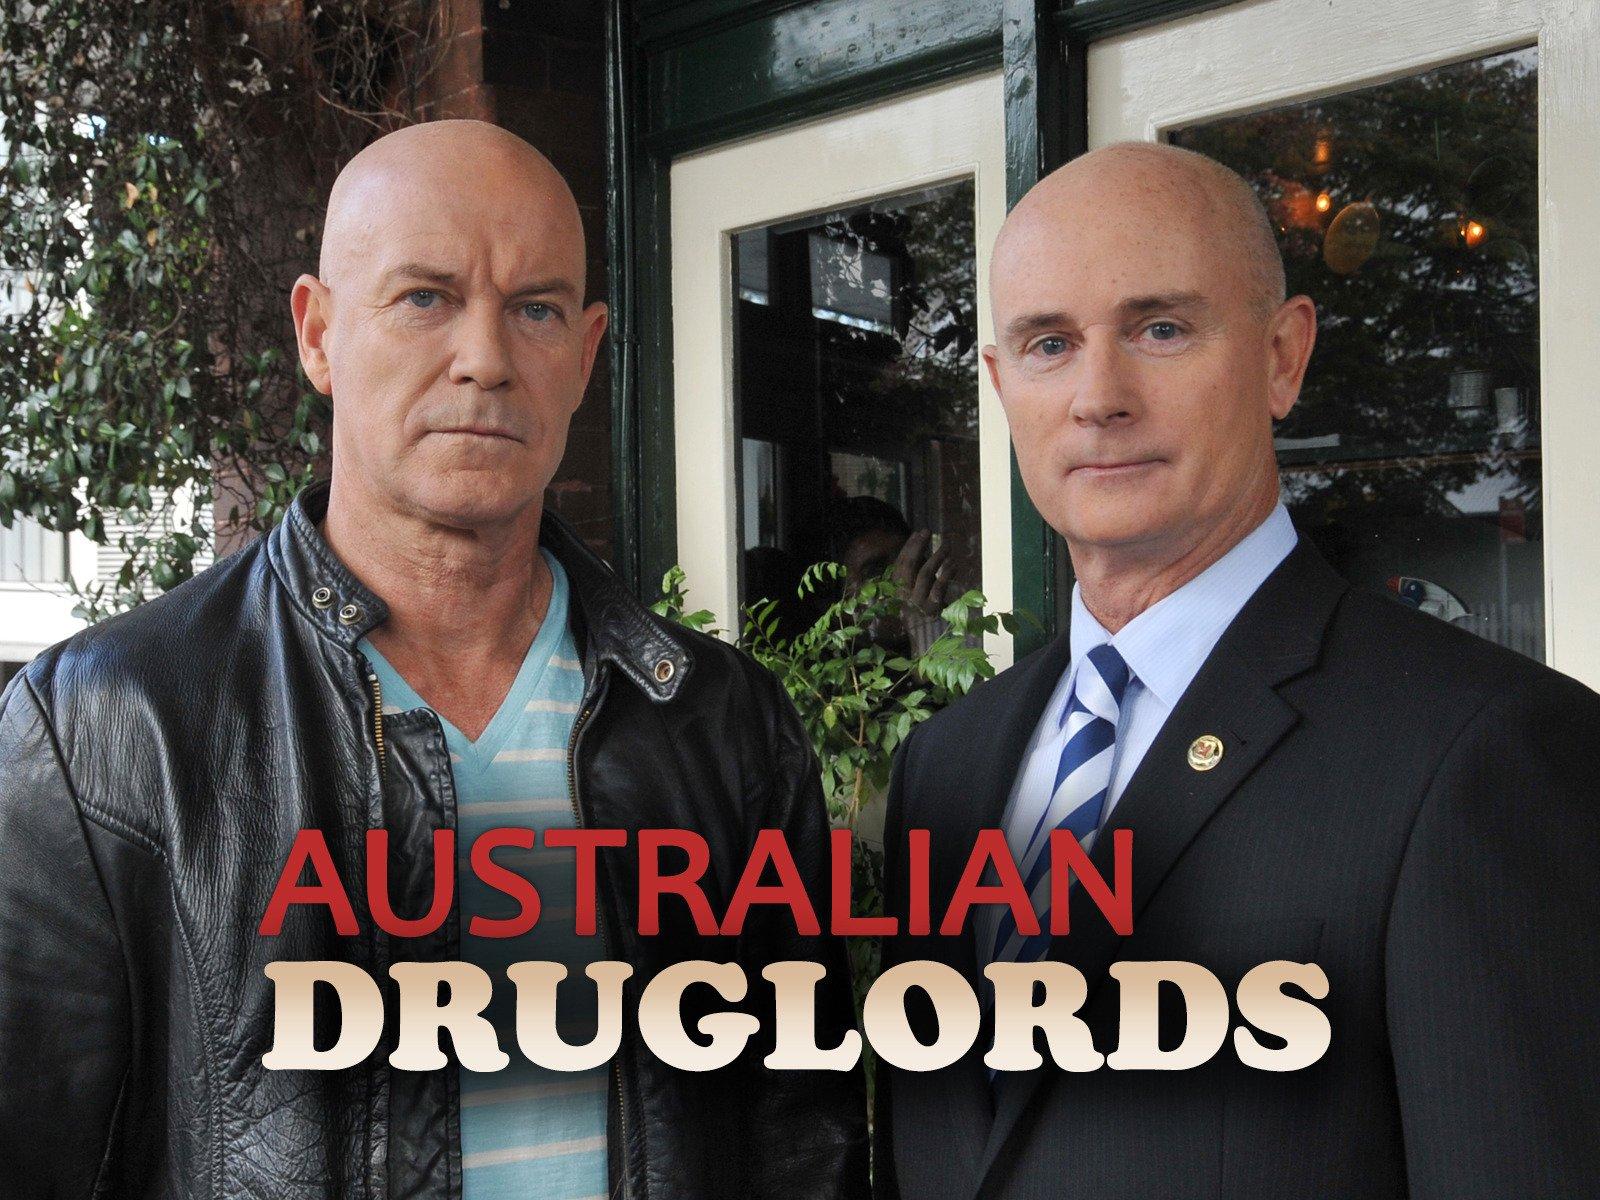 Australian Druglords